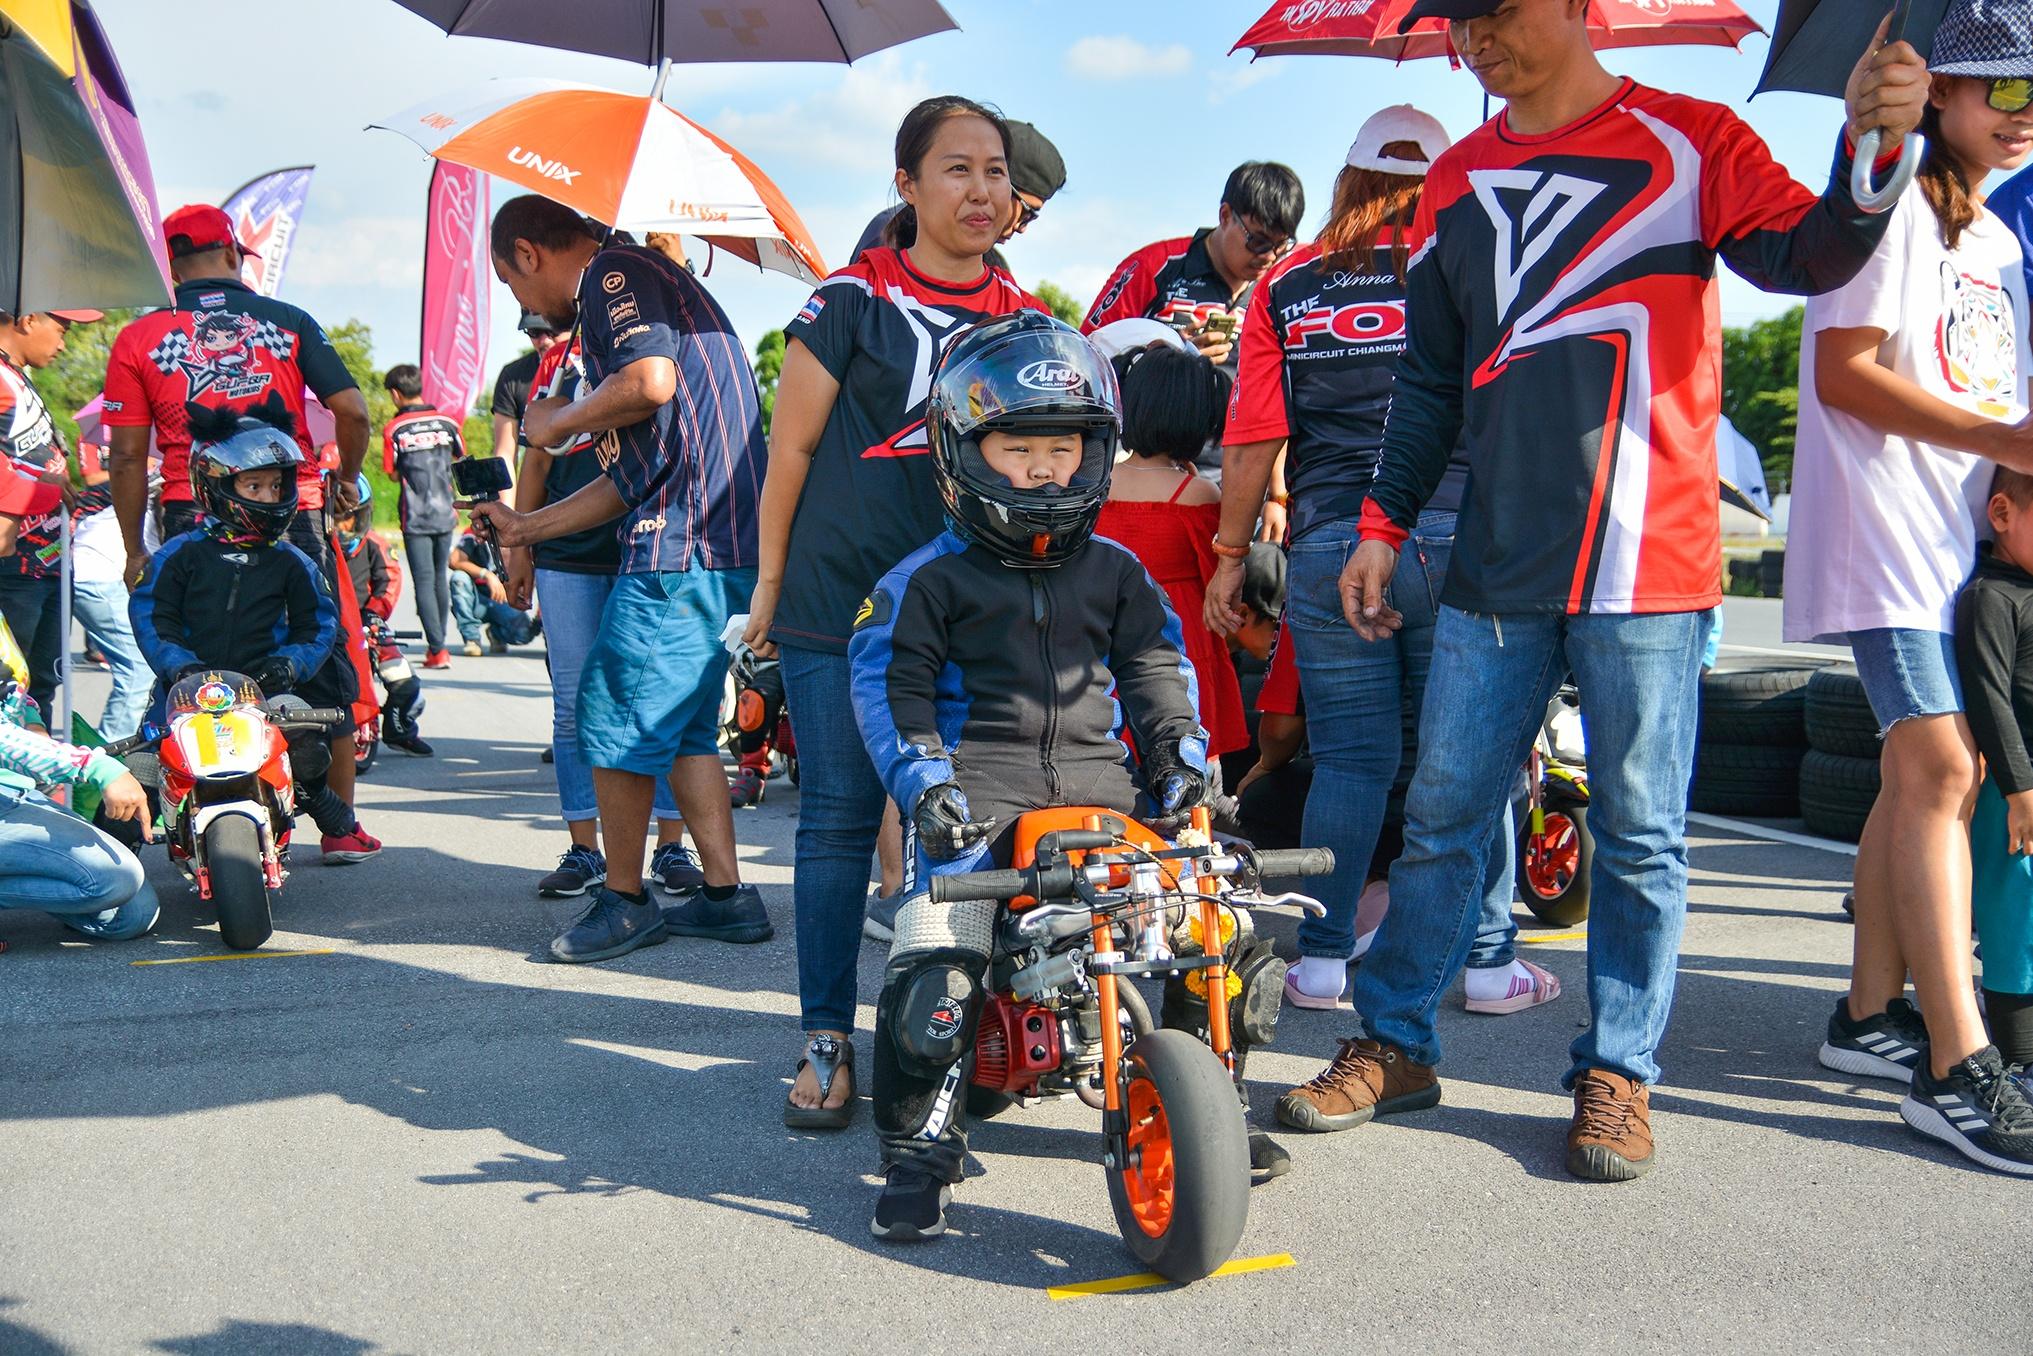 Giai dua moto tre em o Thai Lan va nhung giac mo MotoGP hinh anh 25